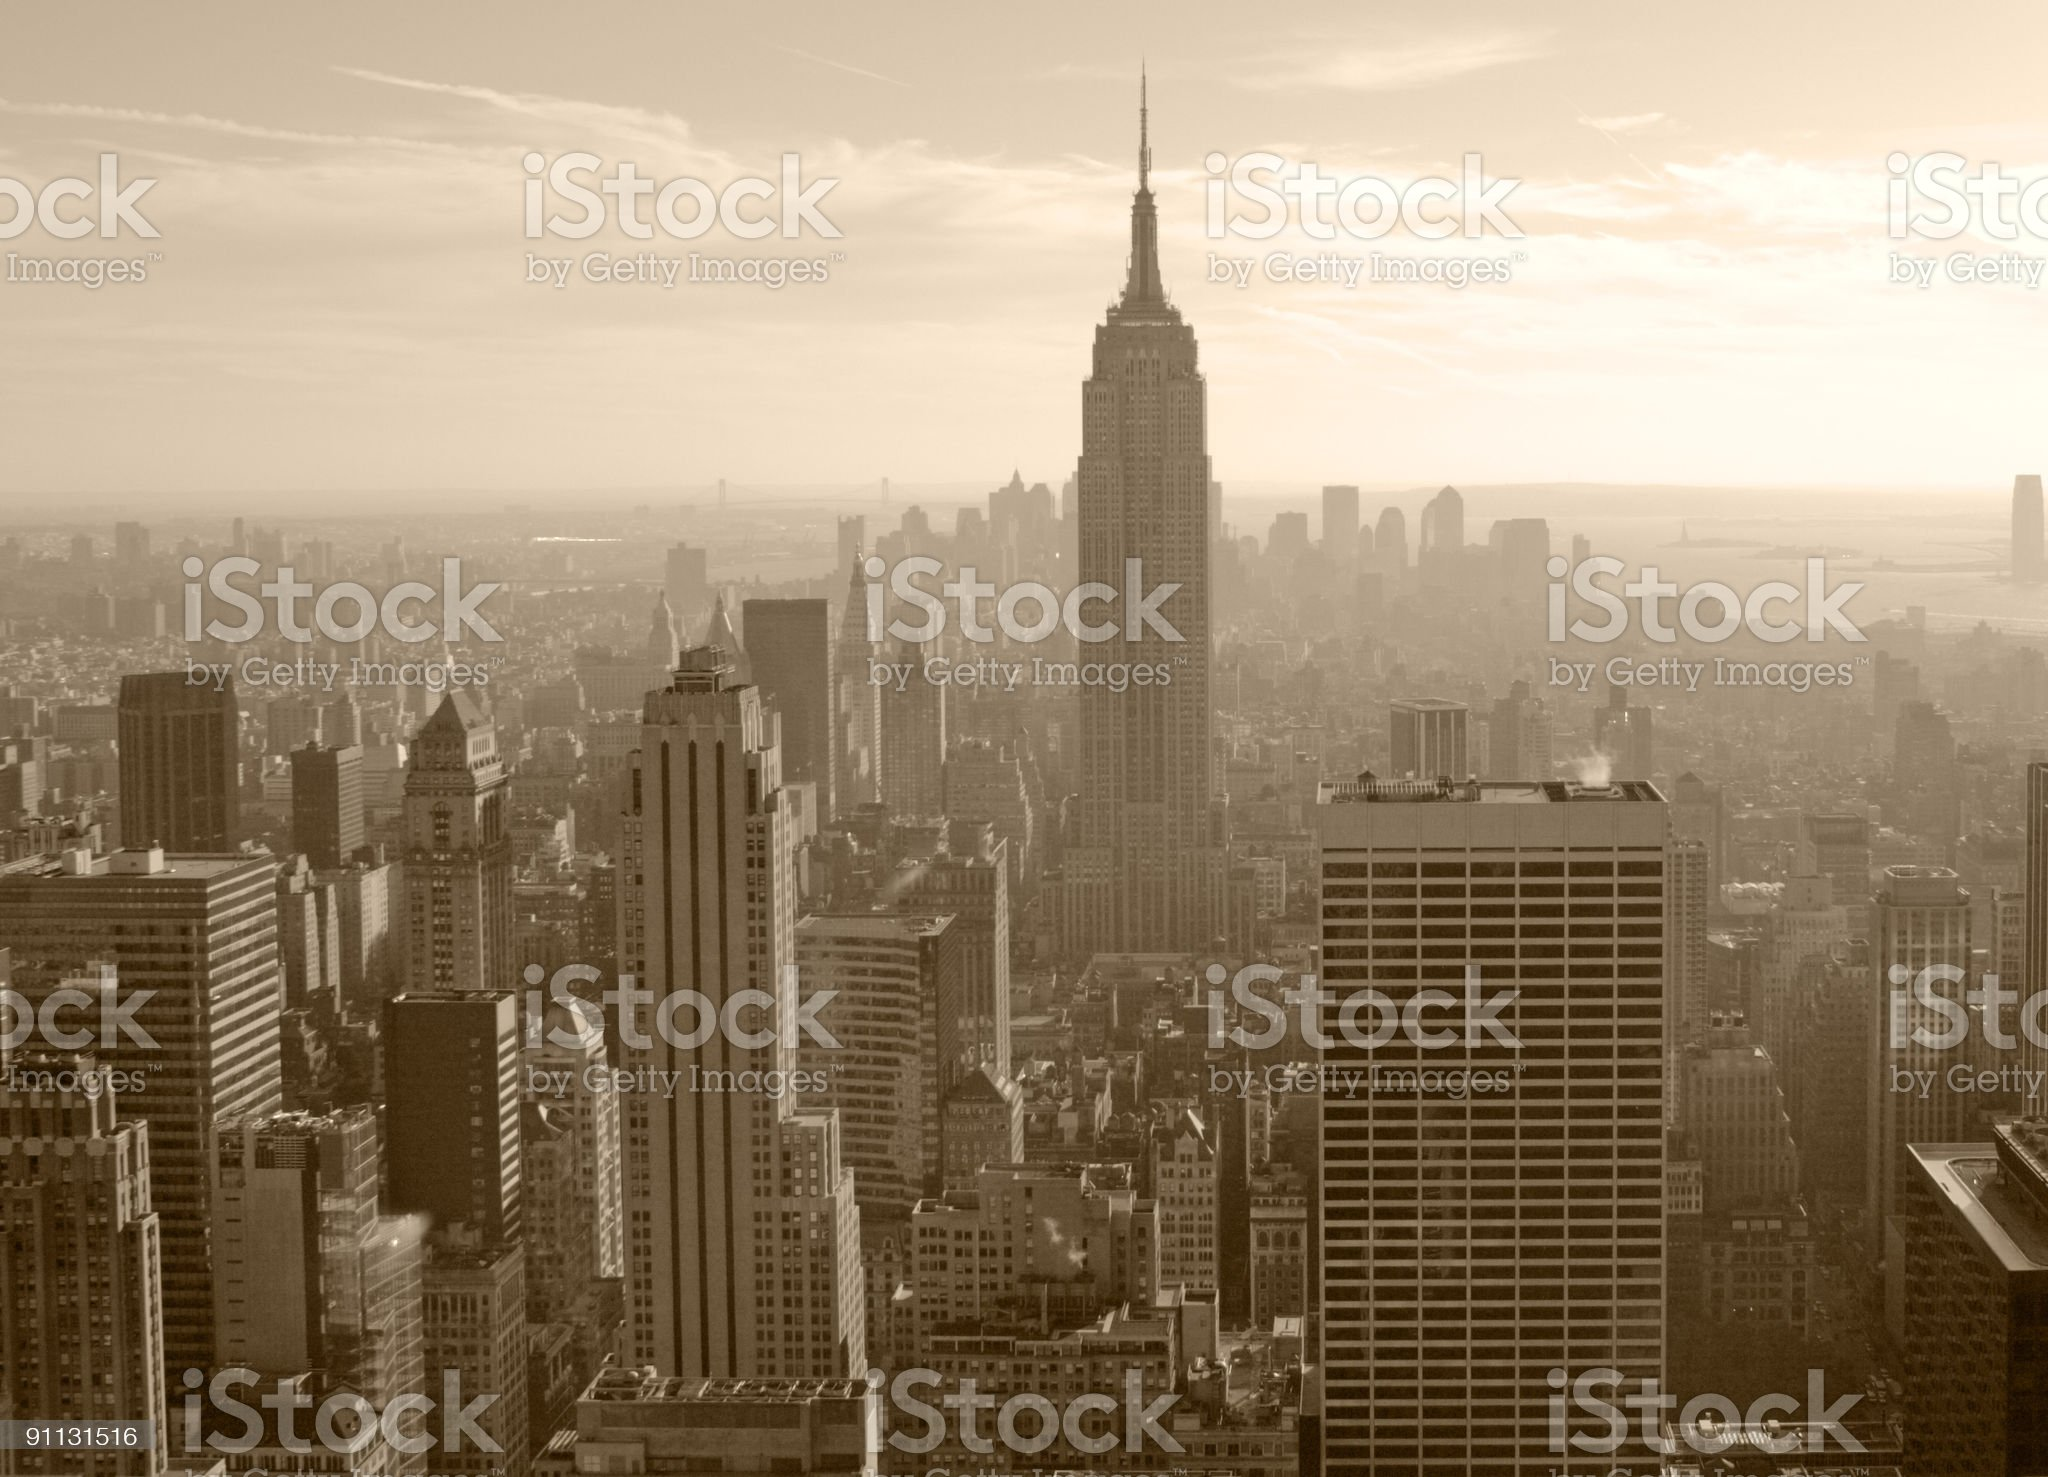 New York Sepia City royalty-free stock photo